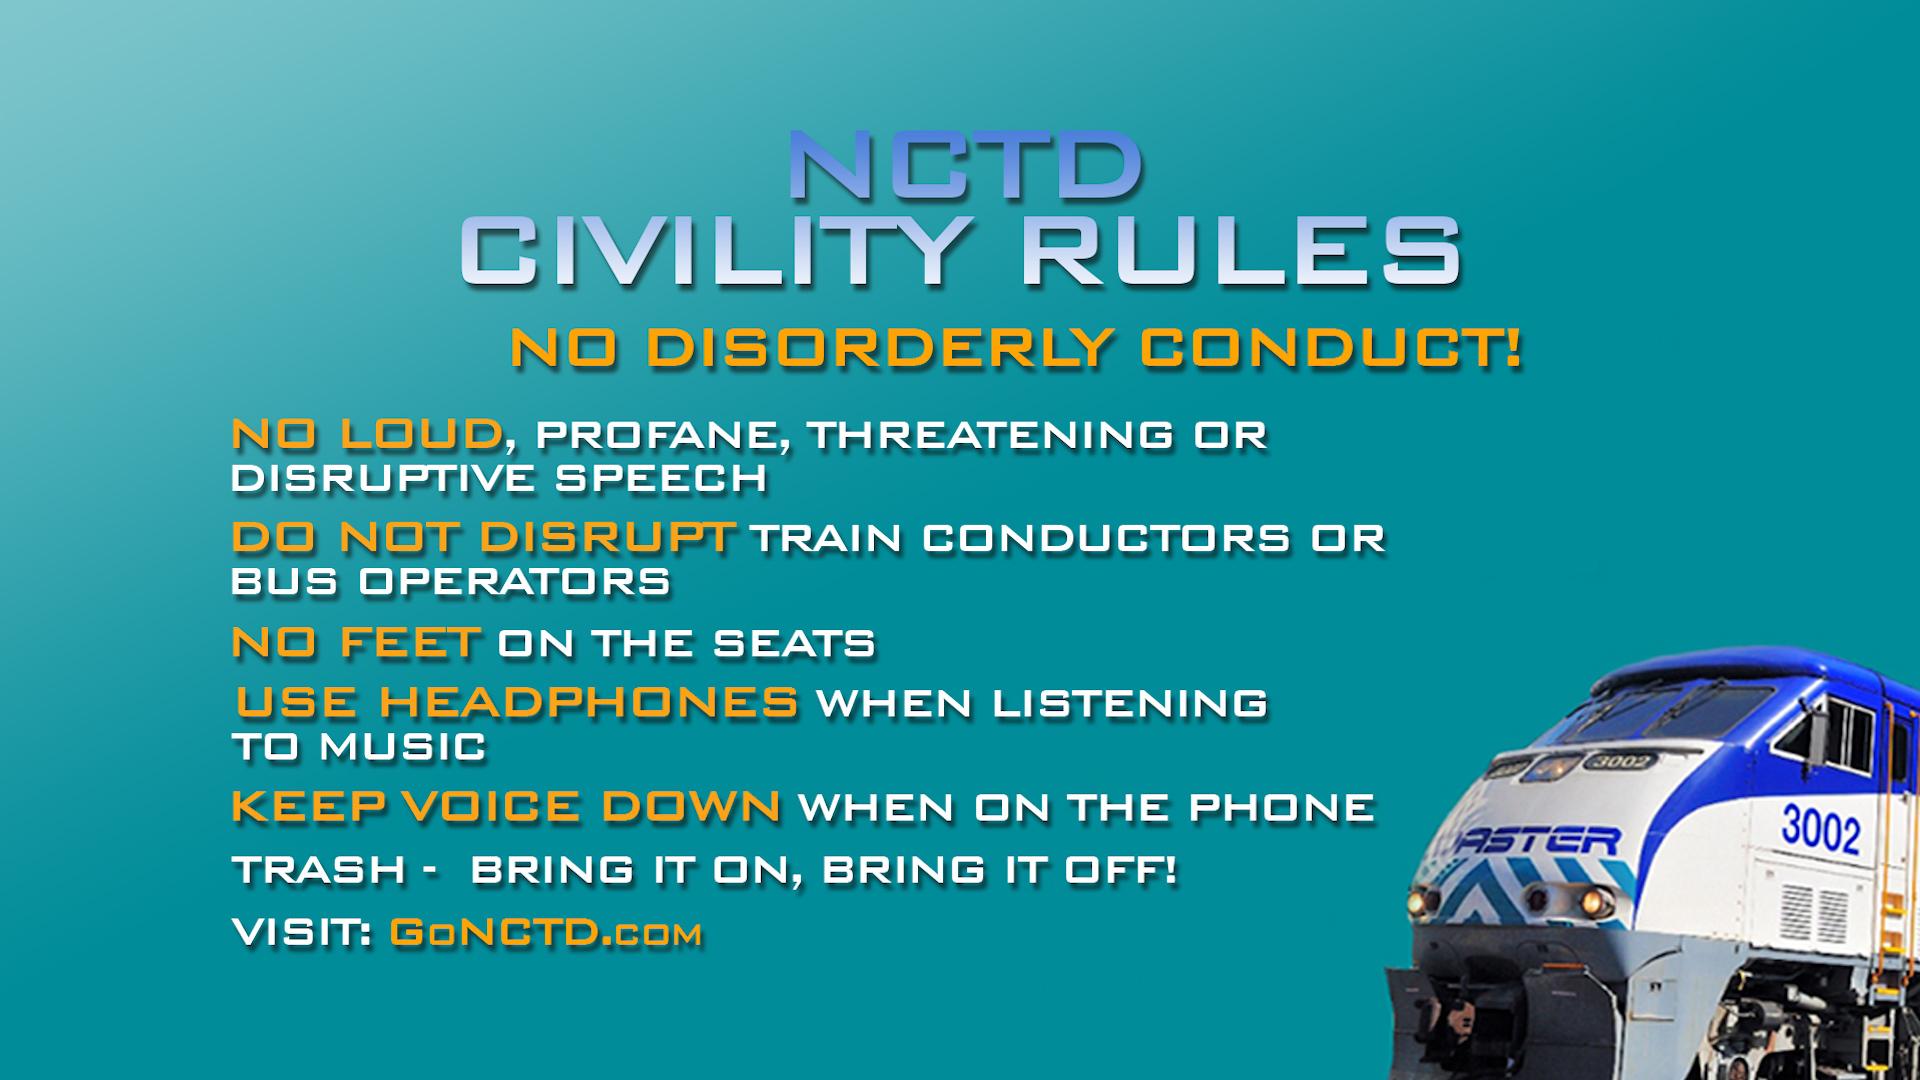 ComCal_NCTD_conduct.jpg